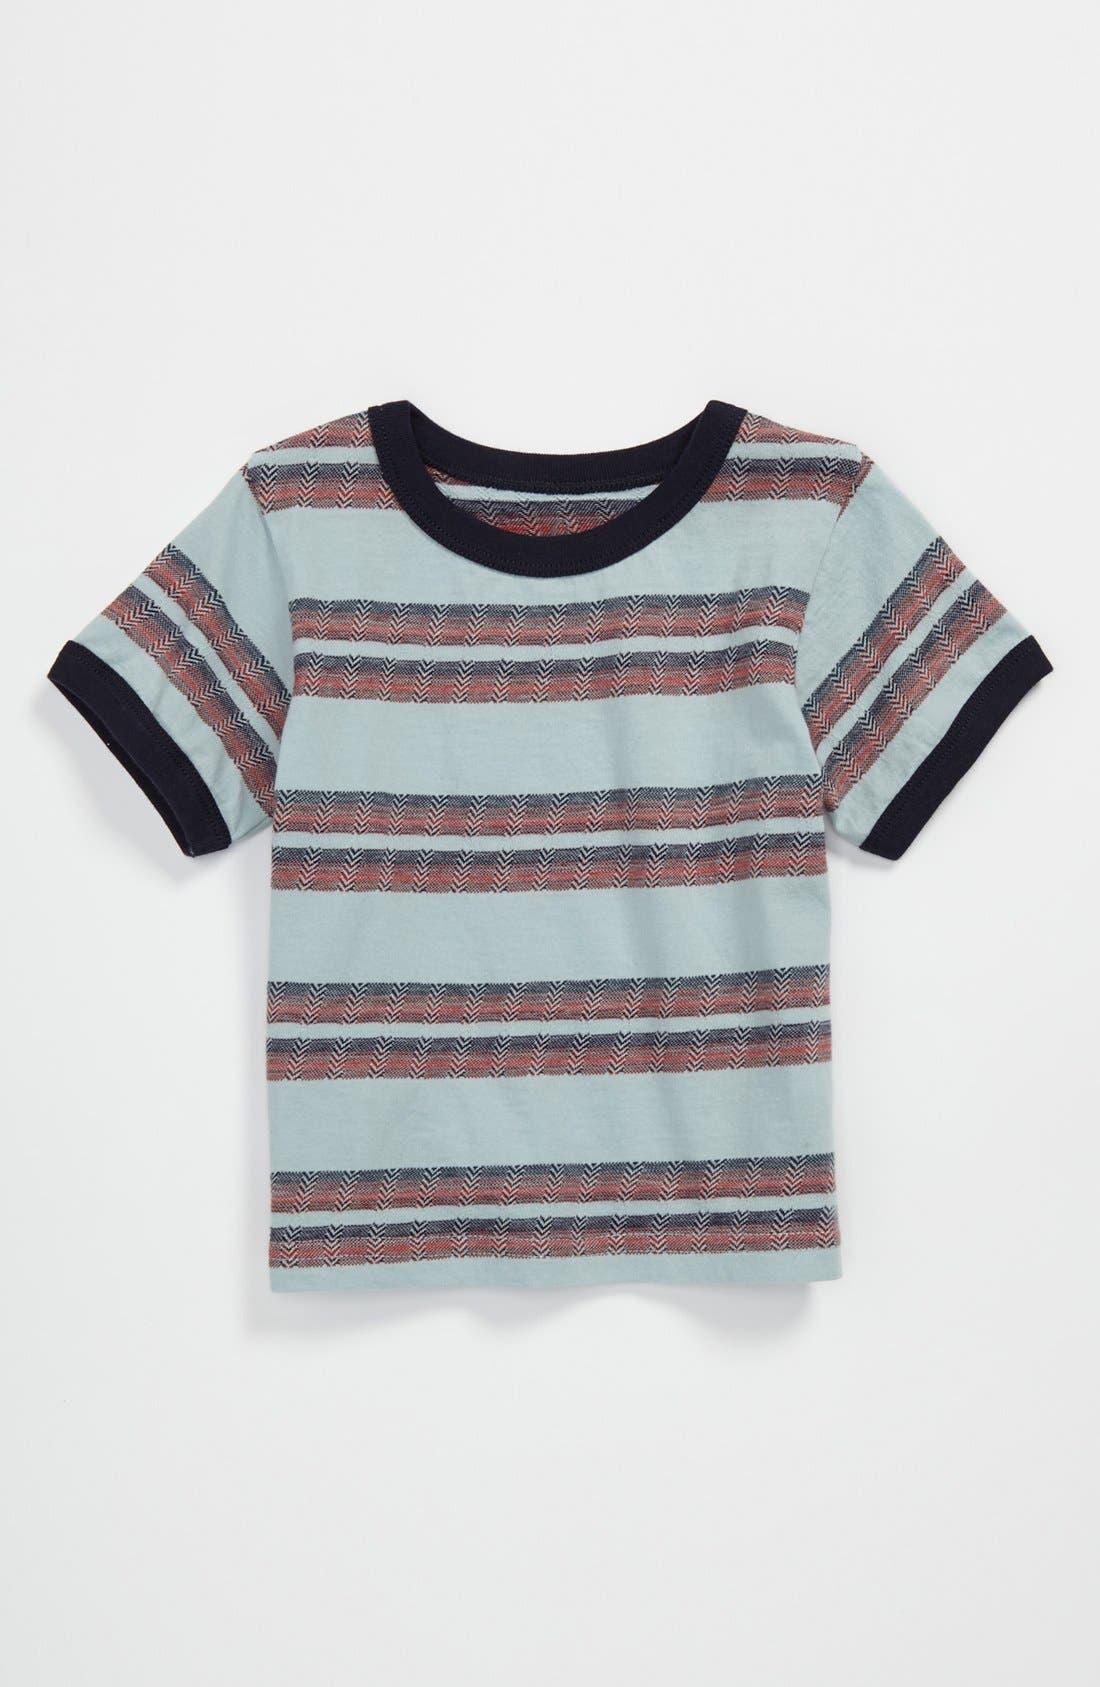 Alternate Image 1 Selected - Peek 'Mateo' T-Shirt (Baby)